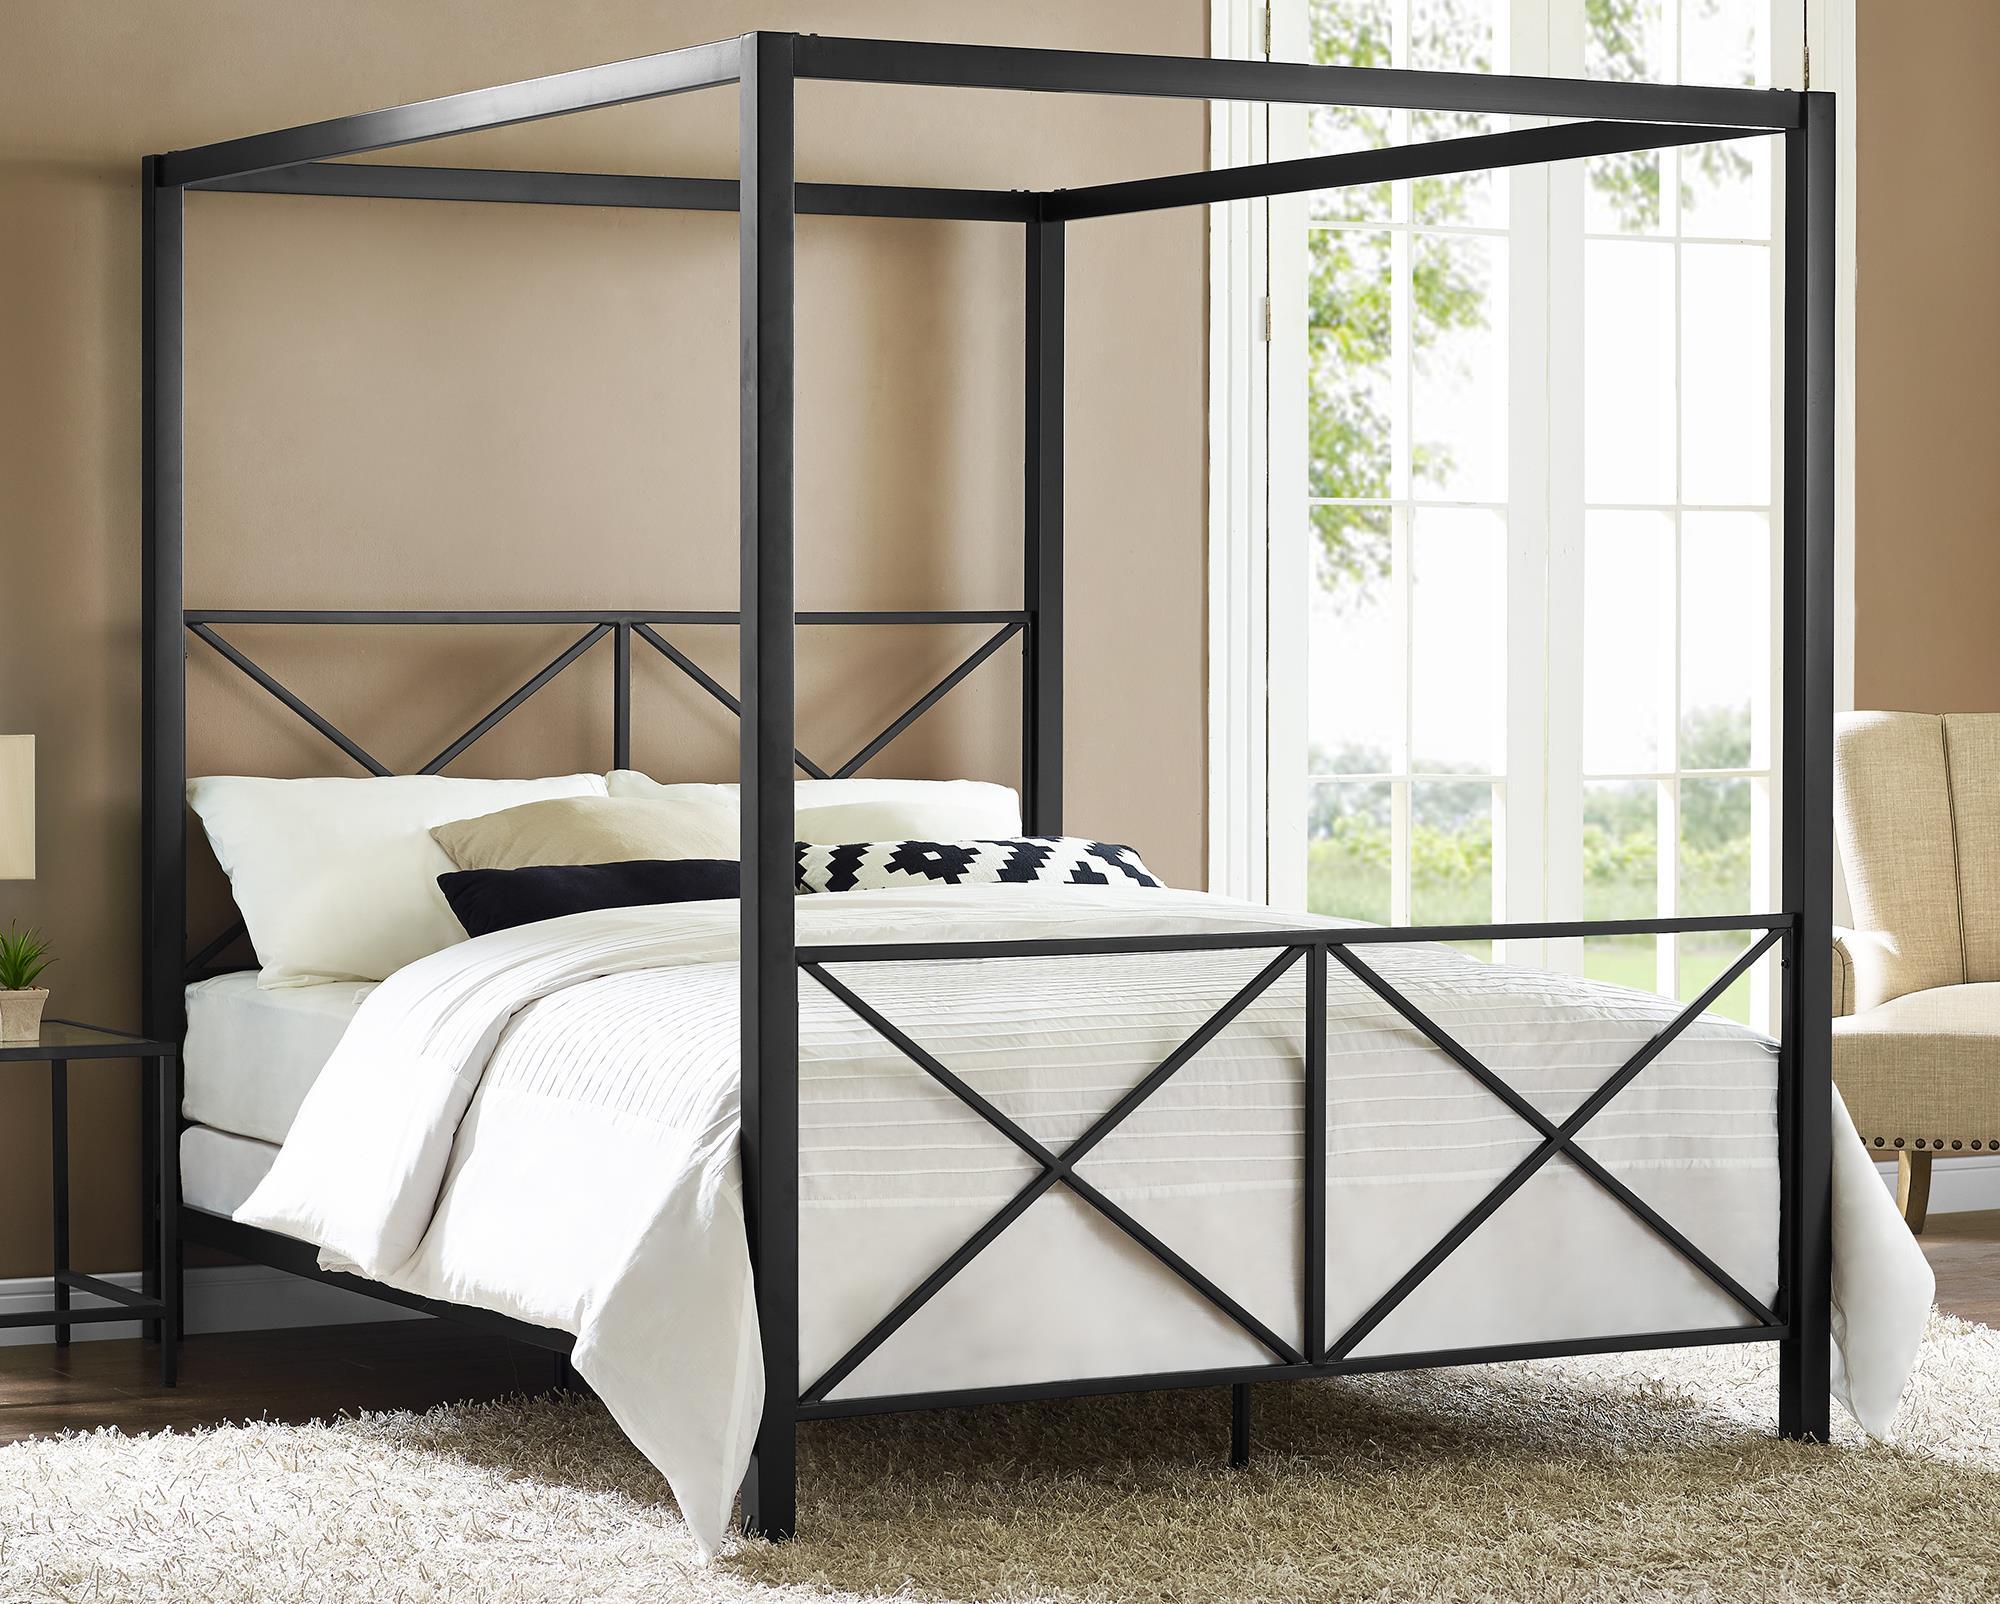 Dorel Rosedale Black Metal Canopy Queen Bed